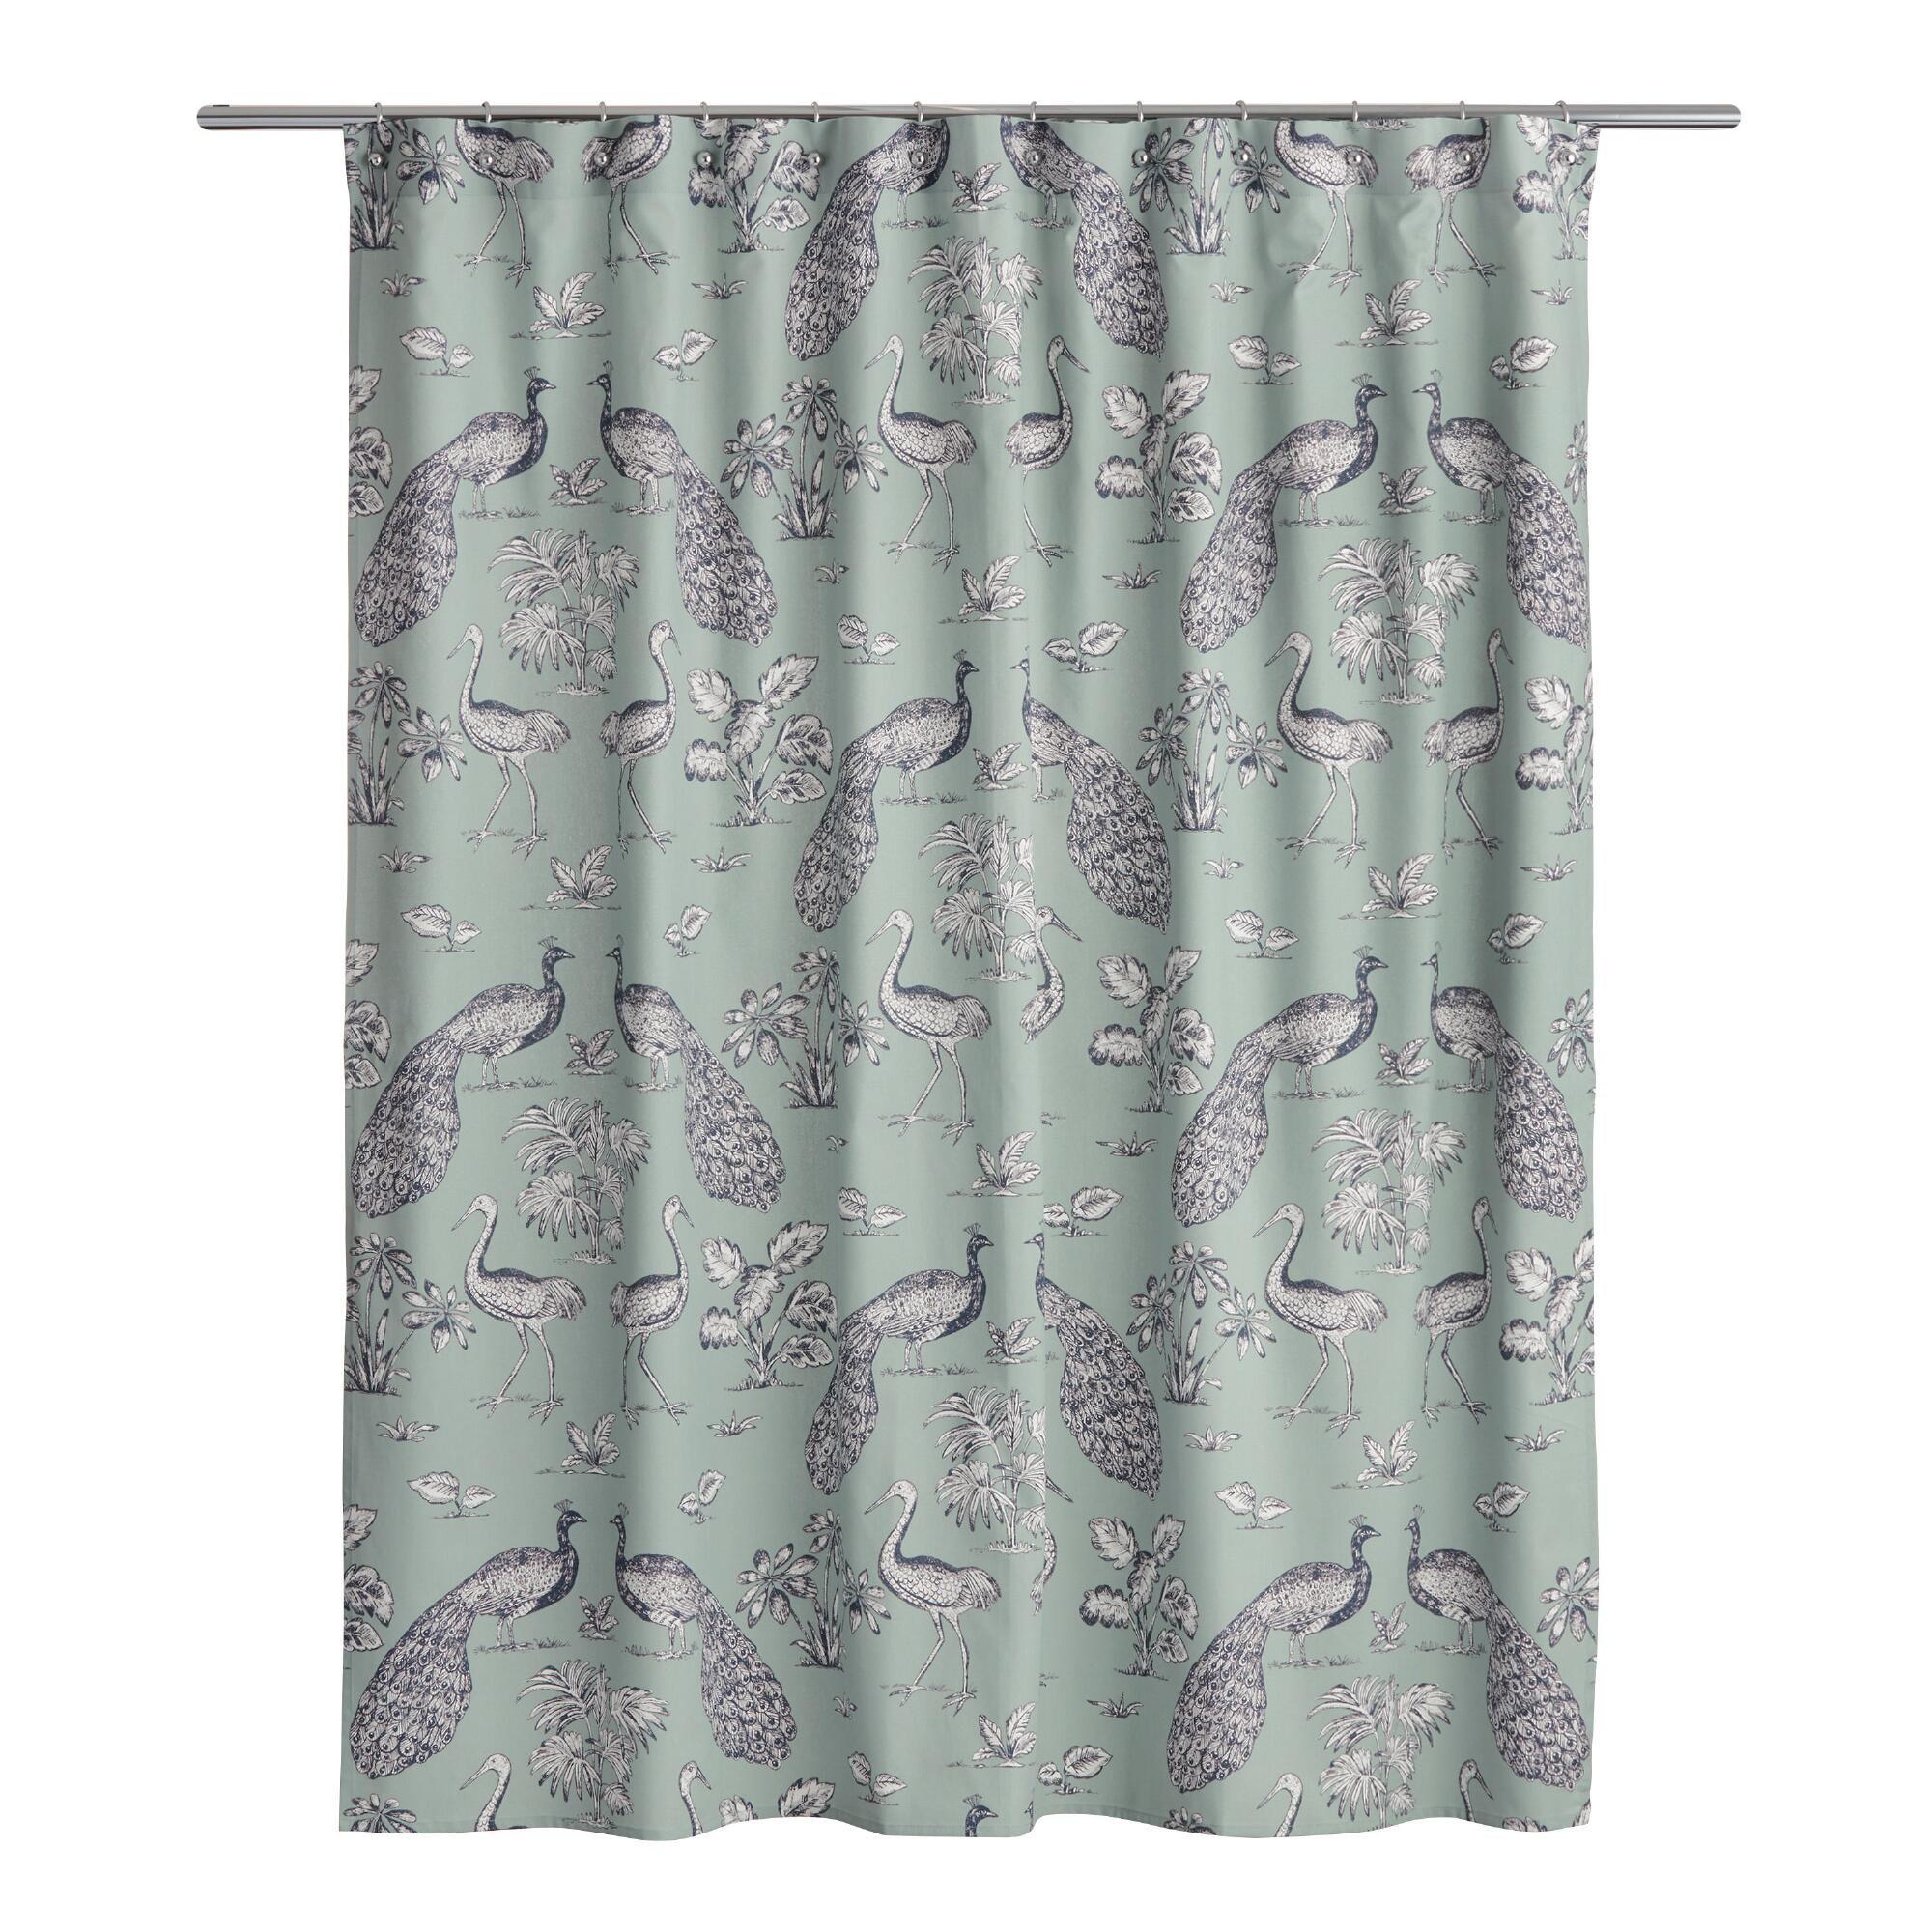 Jadeite And Navy Peacock Marlena Shower Curtain World Market Shower Curtain Curtains Bedding And Bath